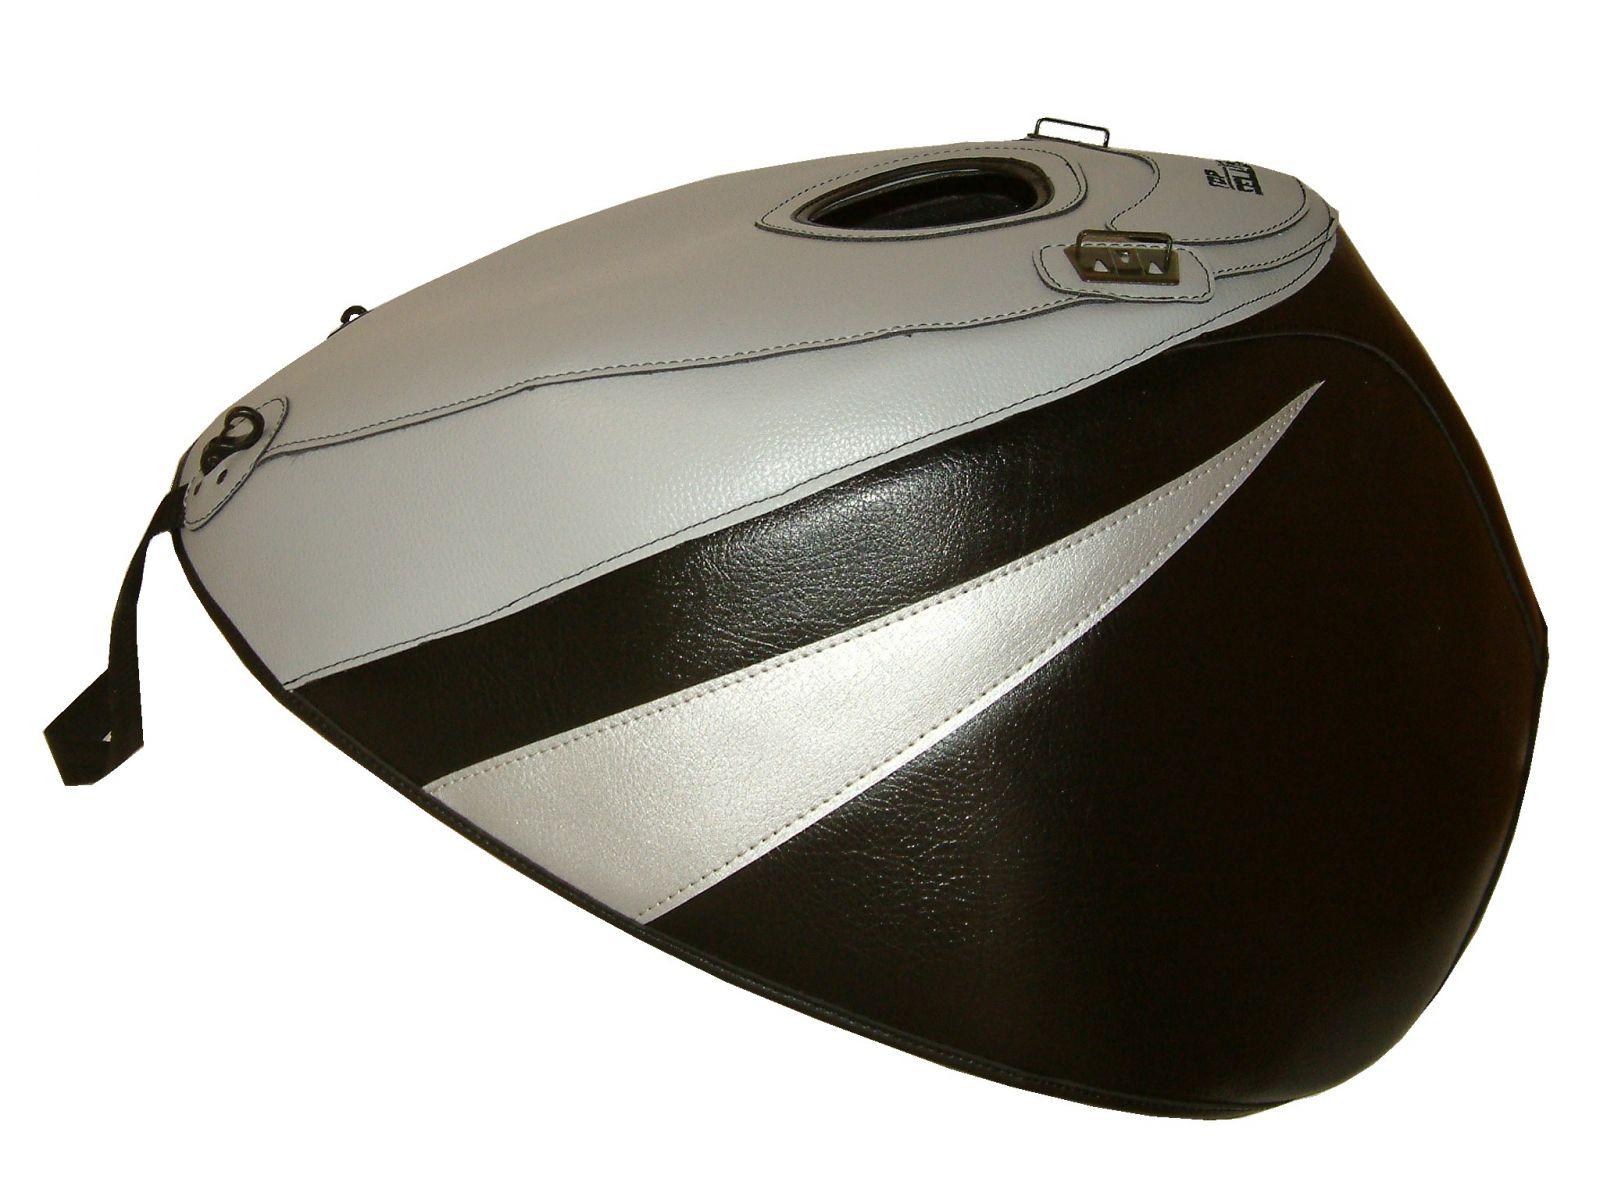 Capa de depósito TPR6054 - SUZUKI GSX-R 1000 [2001-2002]